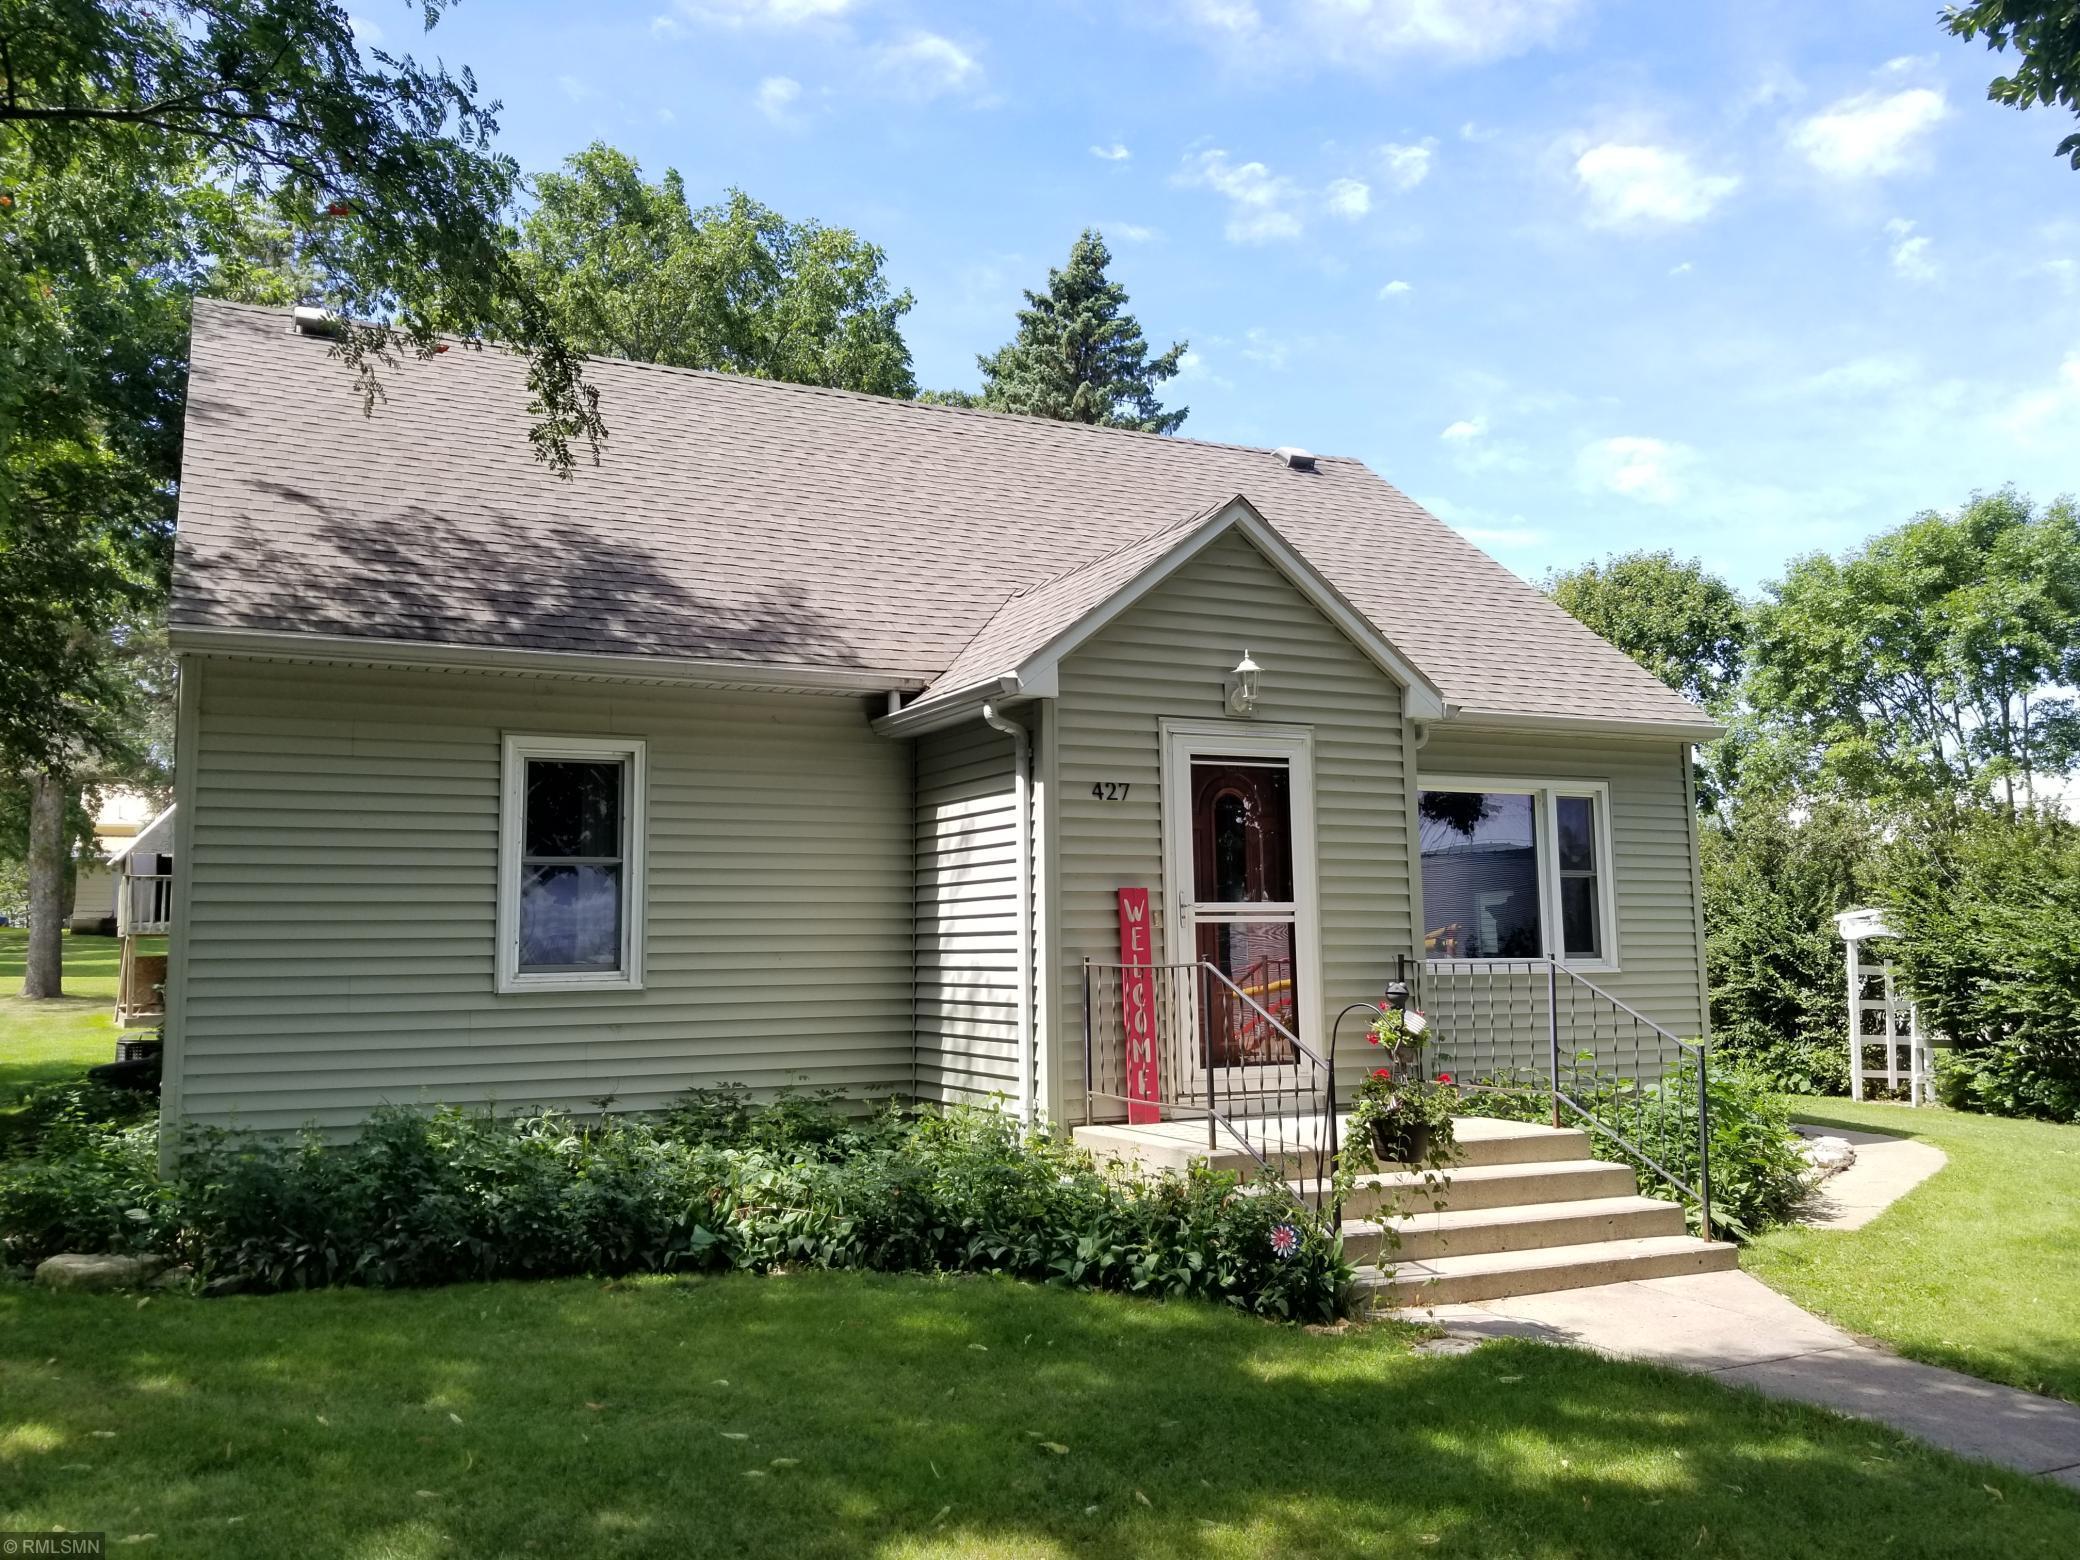 427 N Sherwood Street Property Photo - Ivanhoe, MN real estate listing